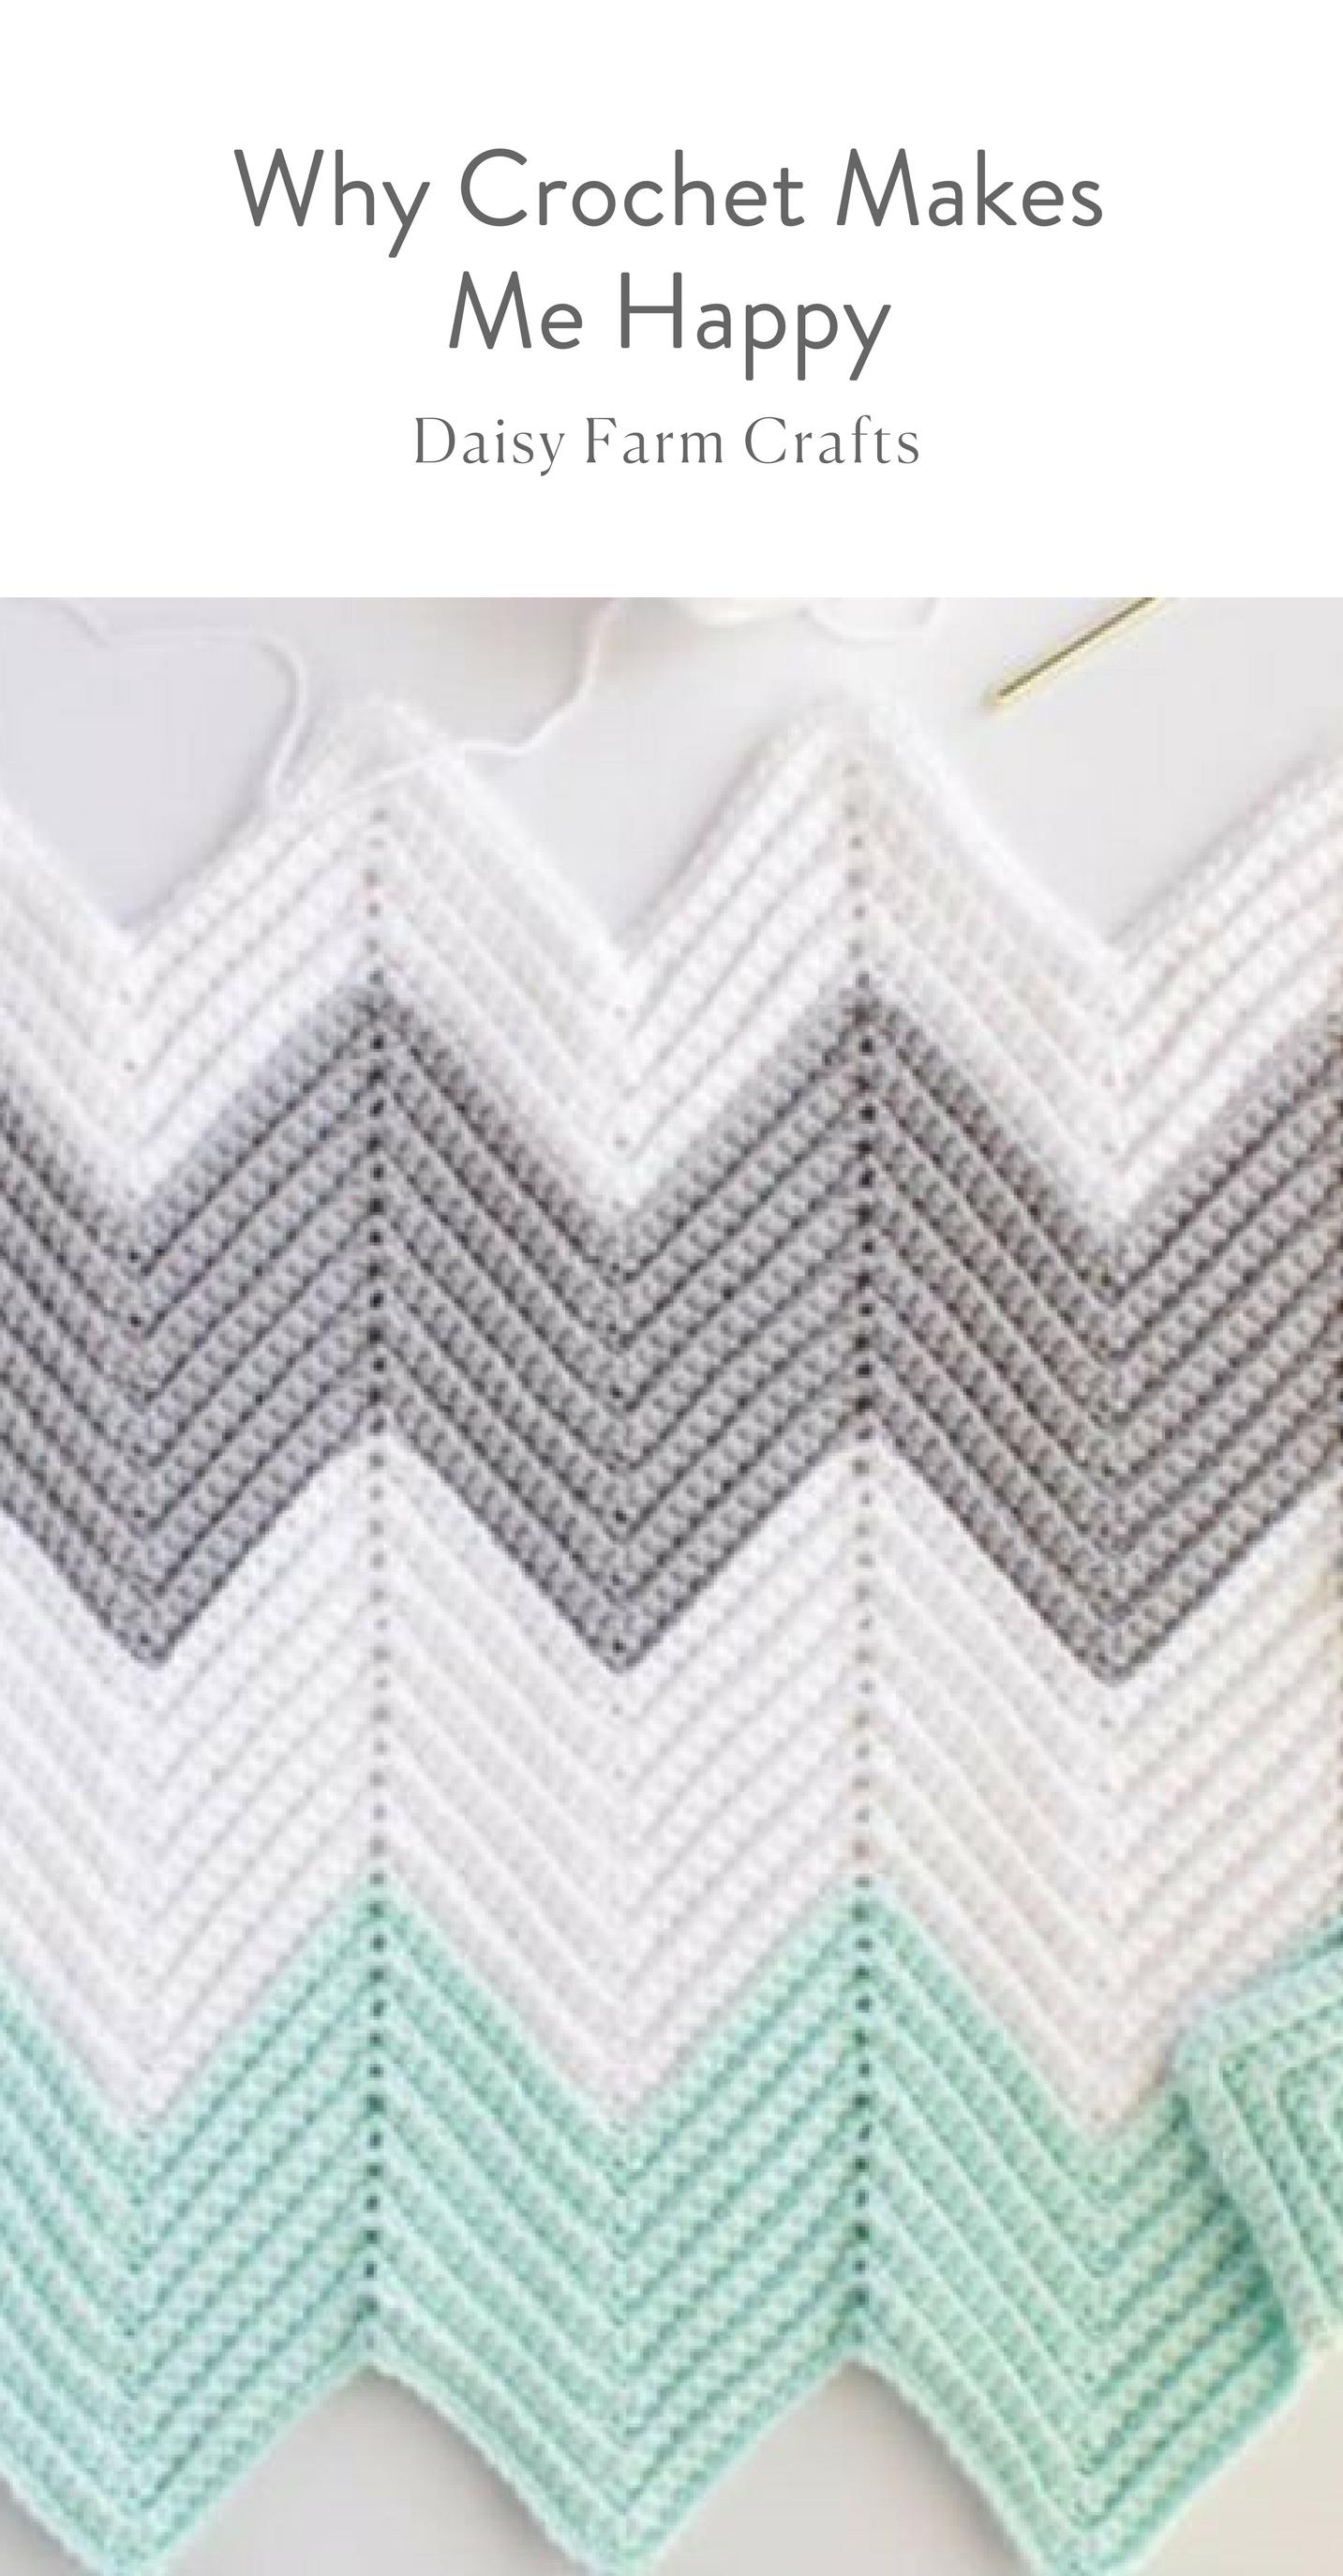 Why Crochet Makes Me Happy - Daisy Farm Crafts Blog | Puntos ...